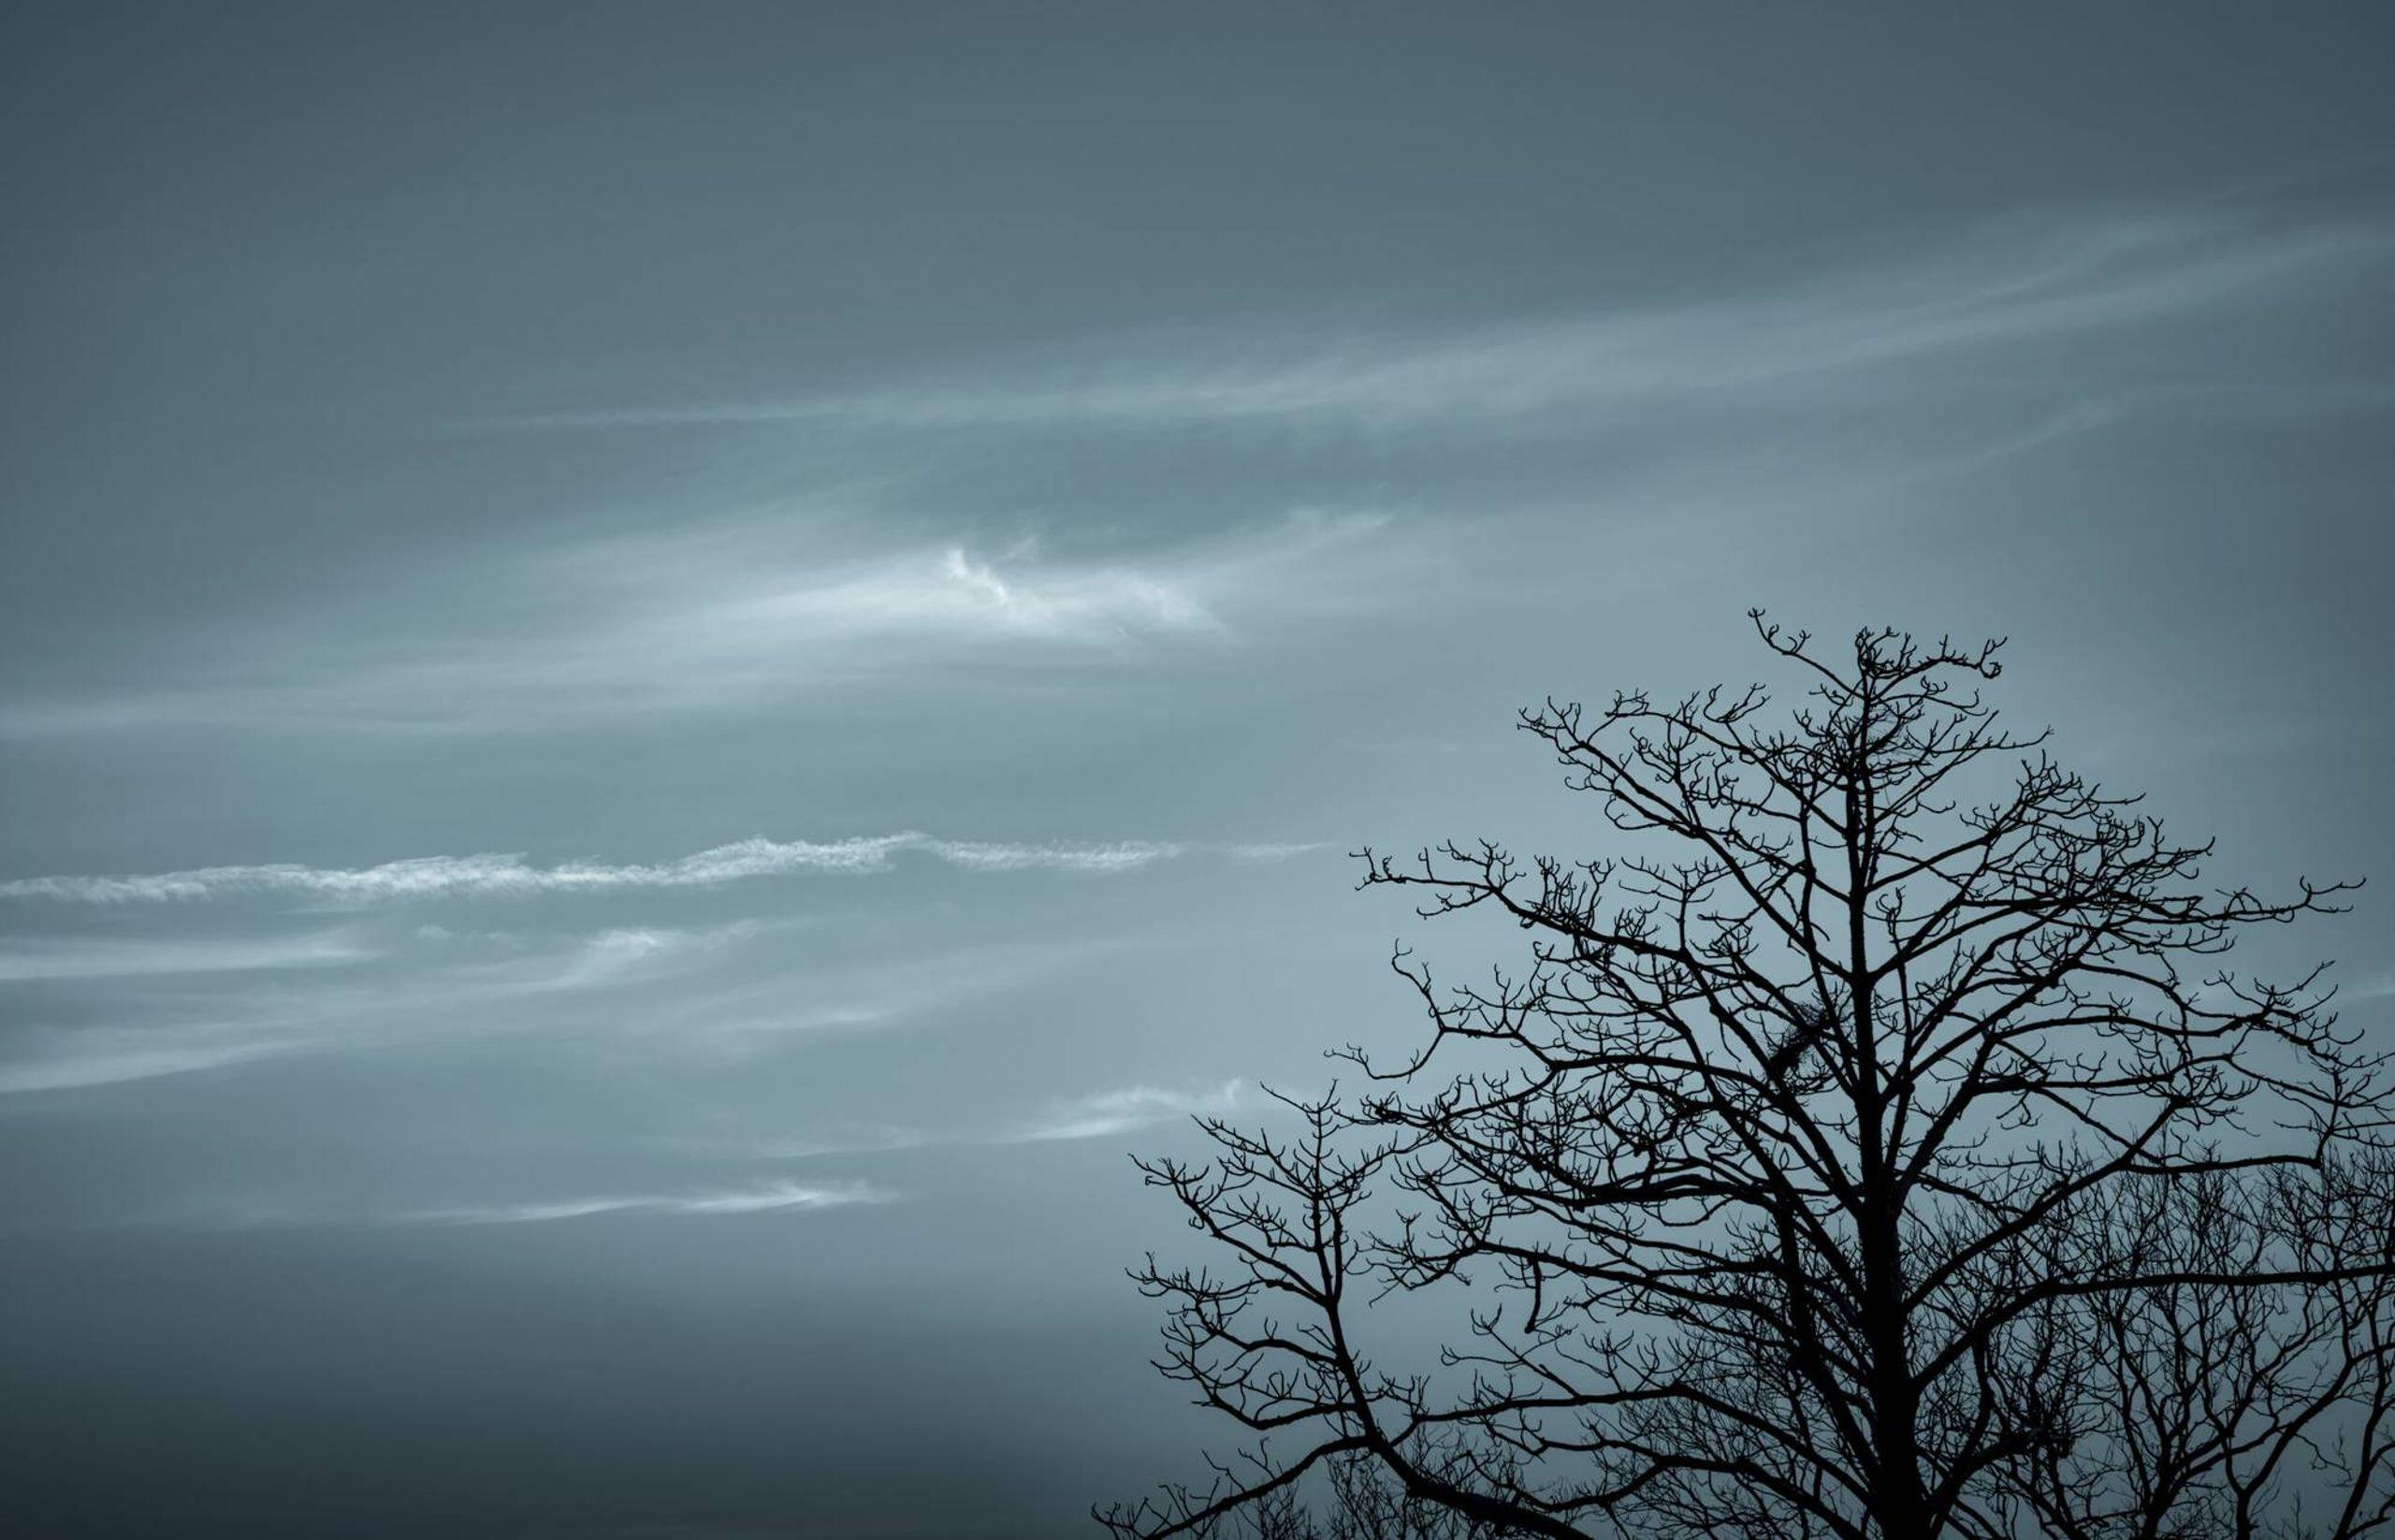 Bare trees, winter sky, blue christmas